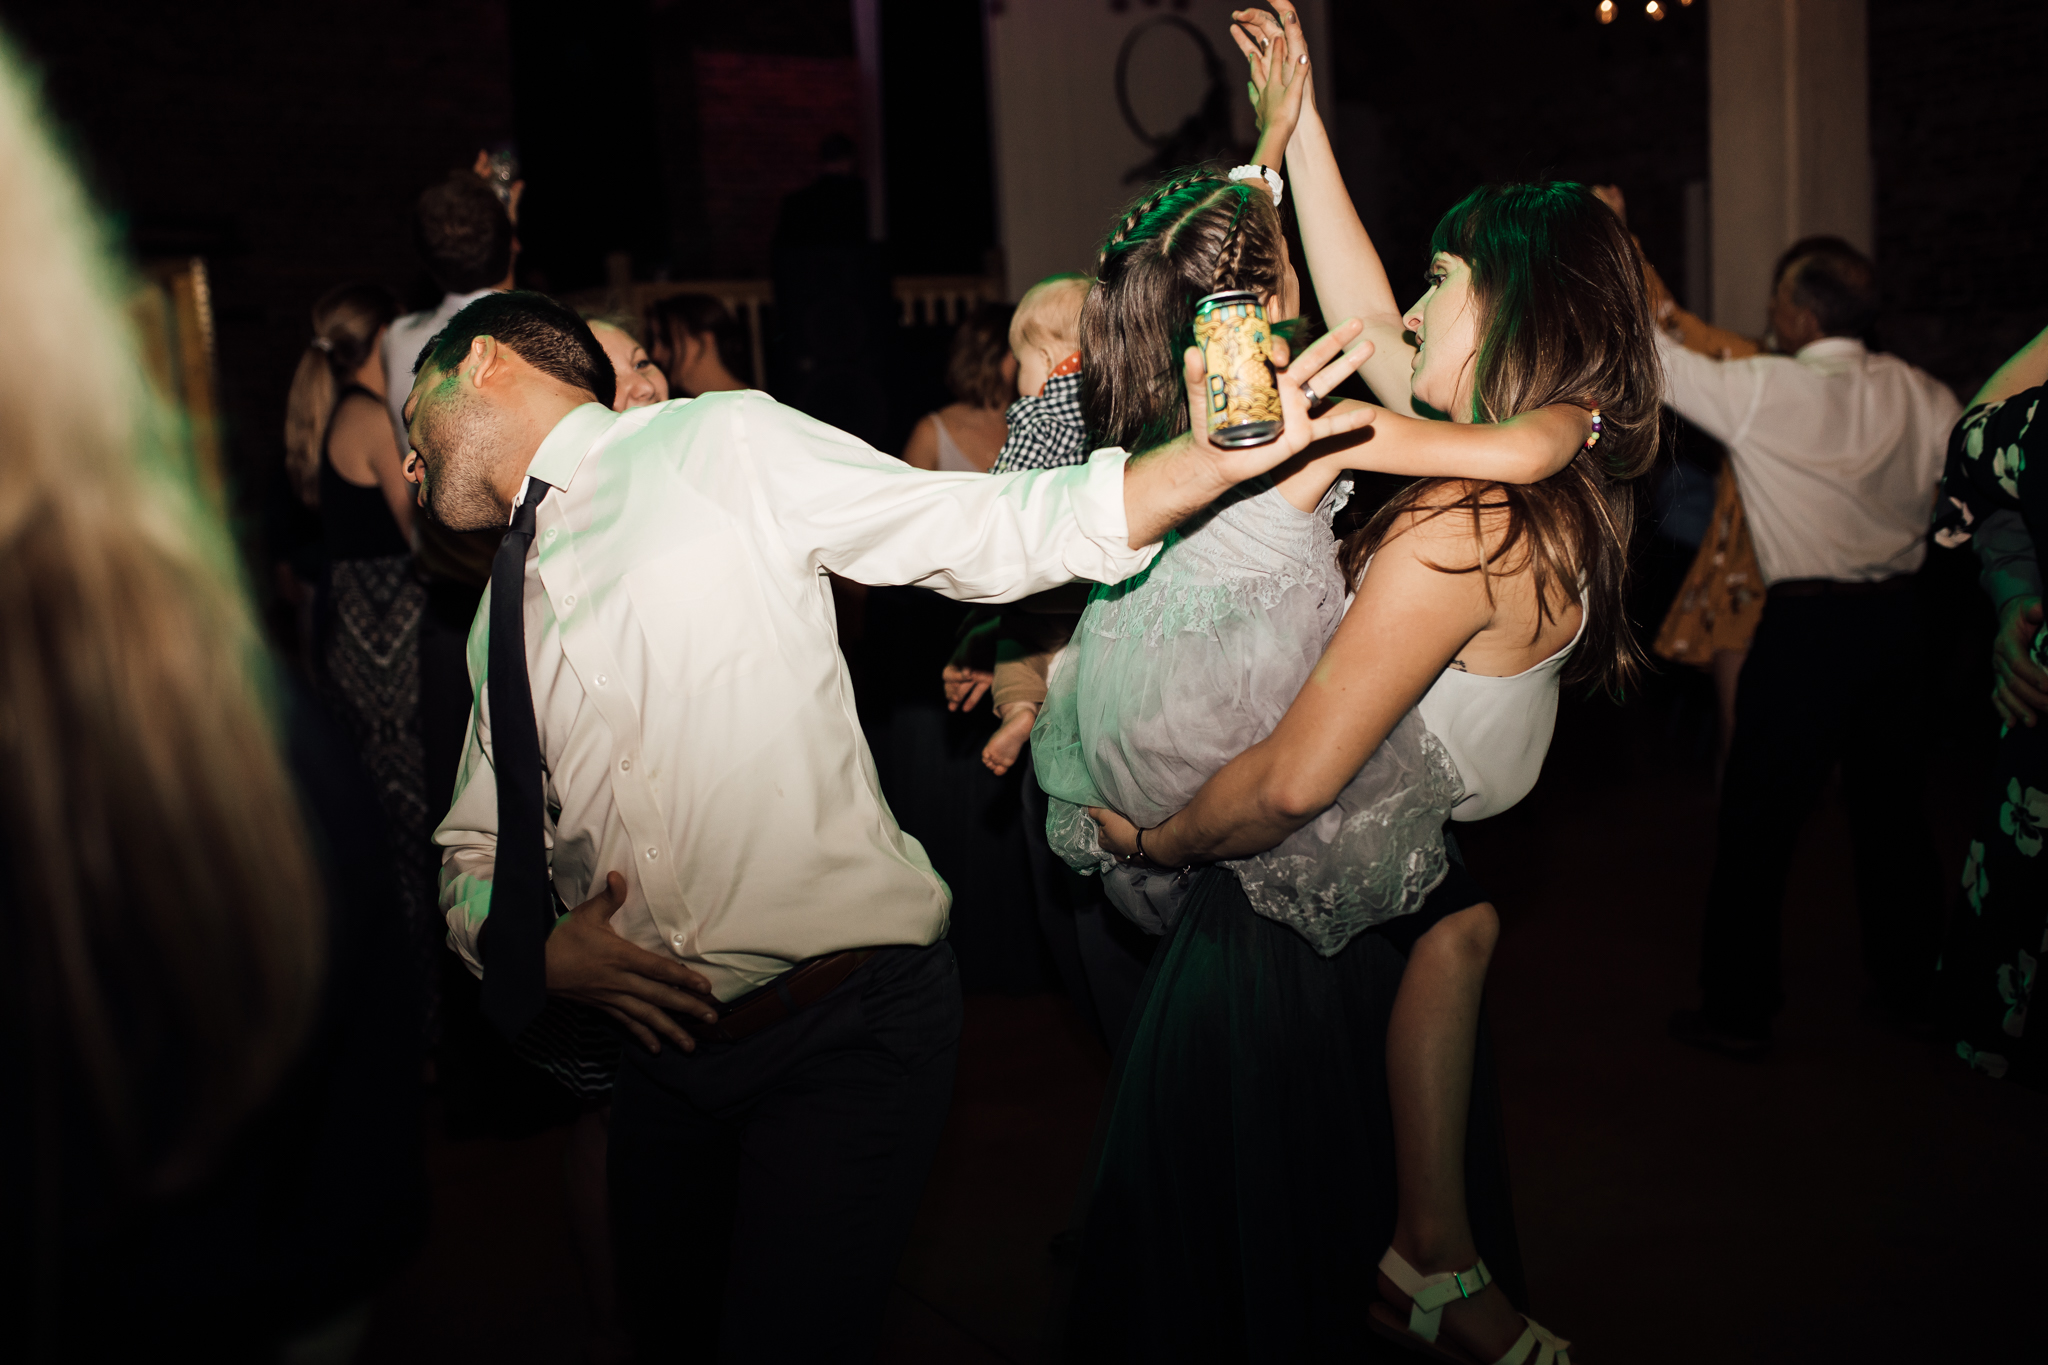 birmingham-alabama-wedding-photographer-laura-terry-the-warmth-around-you (102 of 110).jpg